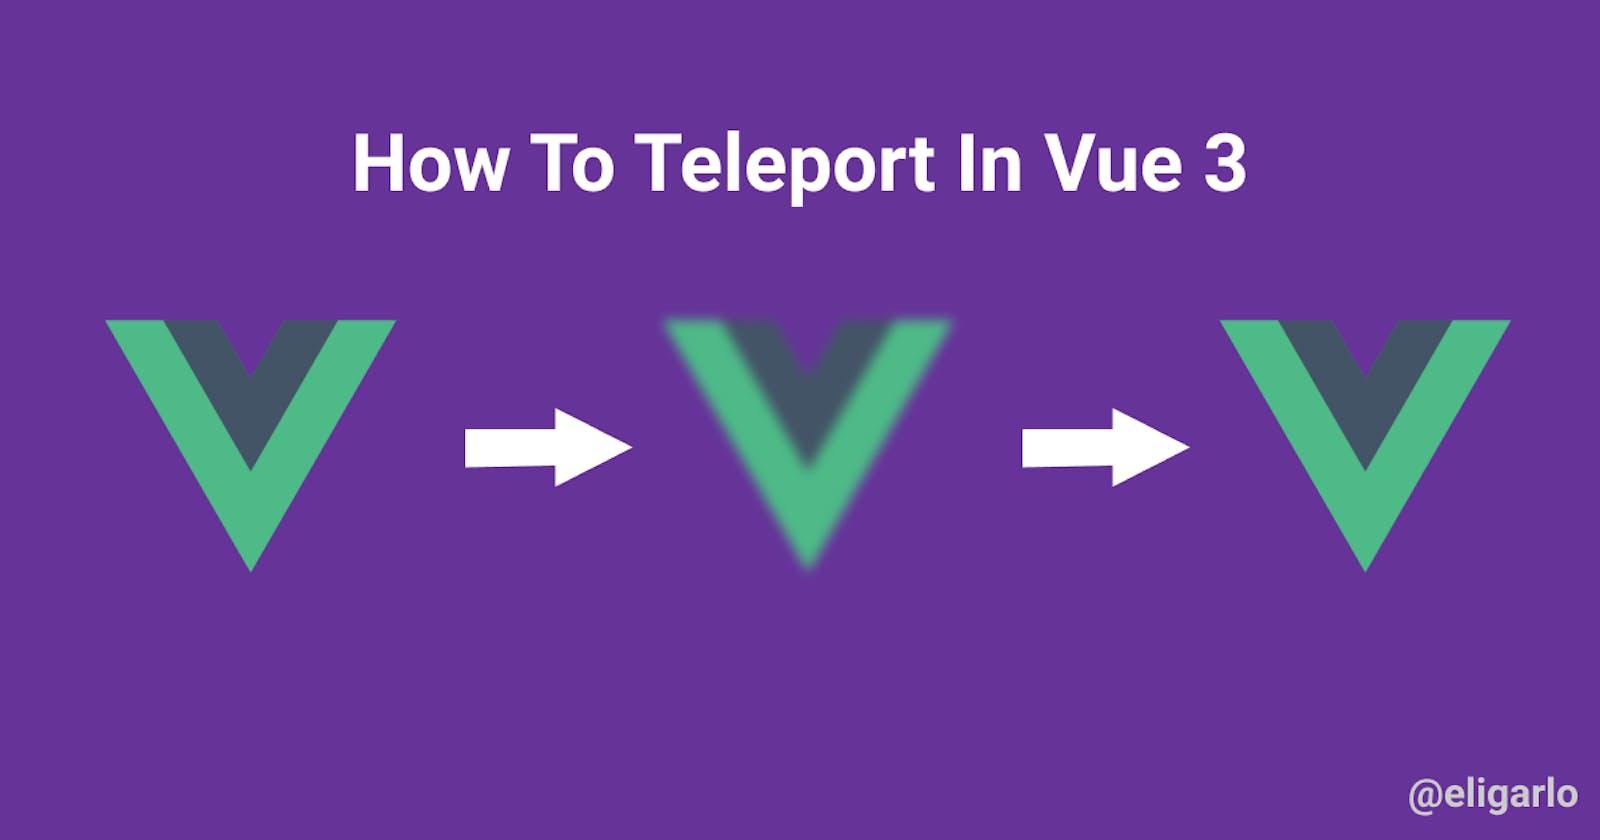 How to Teleport in Vue 3